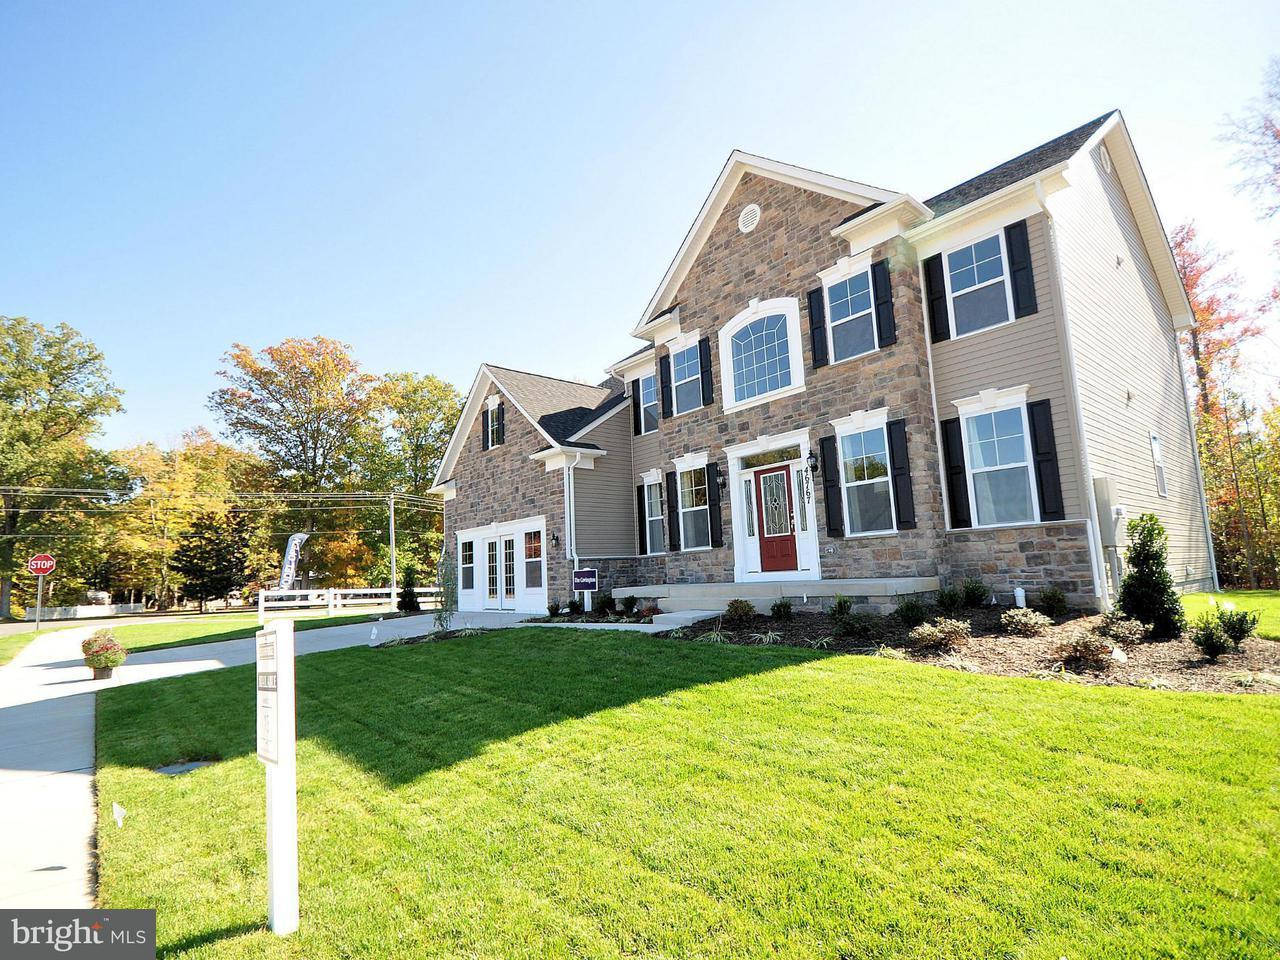 Single Family Home for Sale at 46767 AL MAR Street 46767 AL MAR Street Lexington Park, Maryland 20653 United States